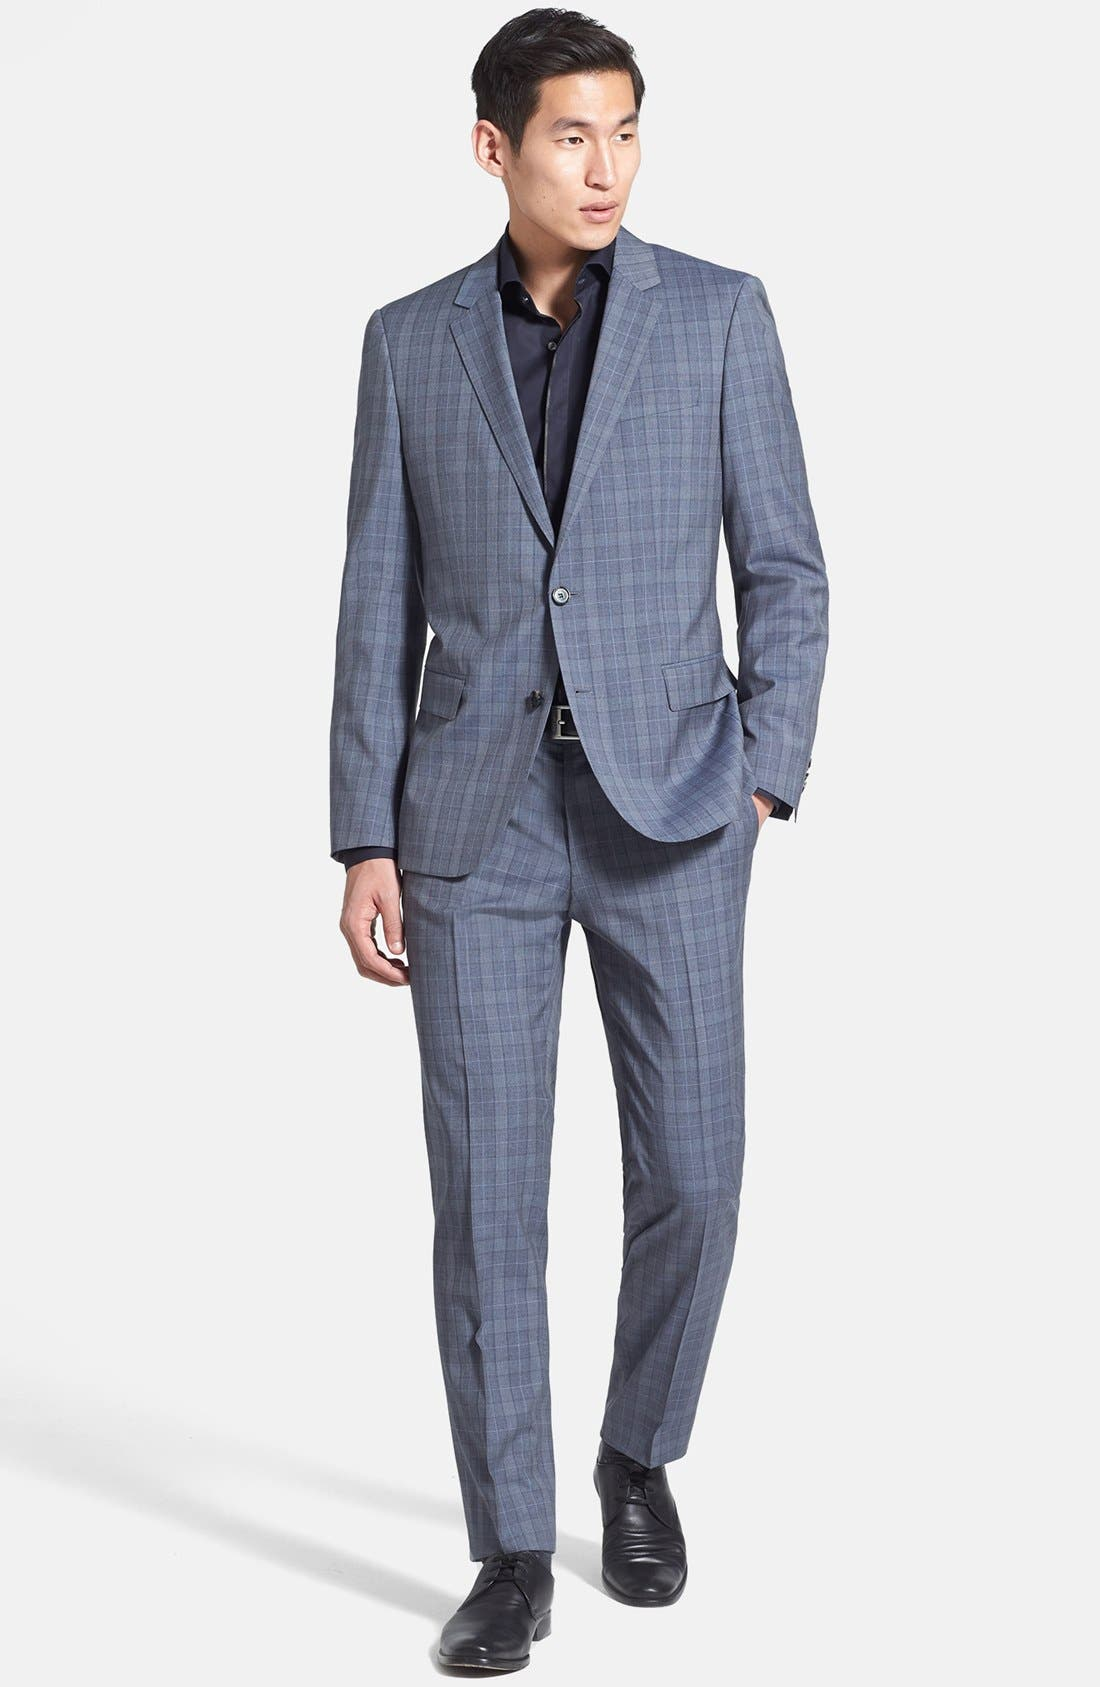 Alternate Image 1 Selected - BOSS HUGO BOSS Suit & Dress Shirt